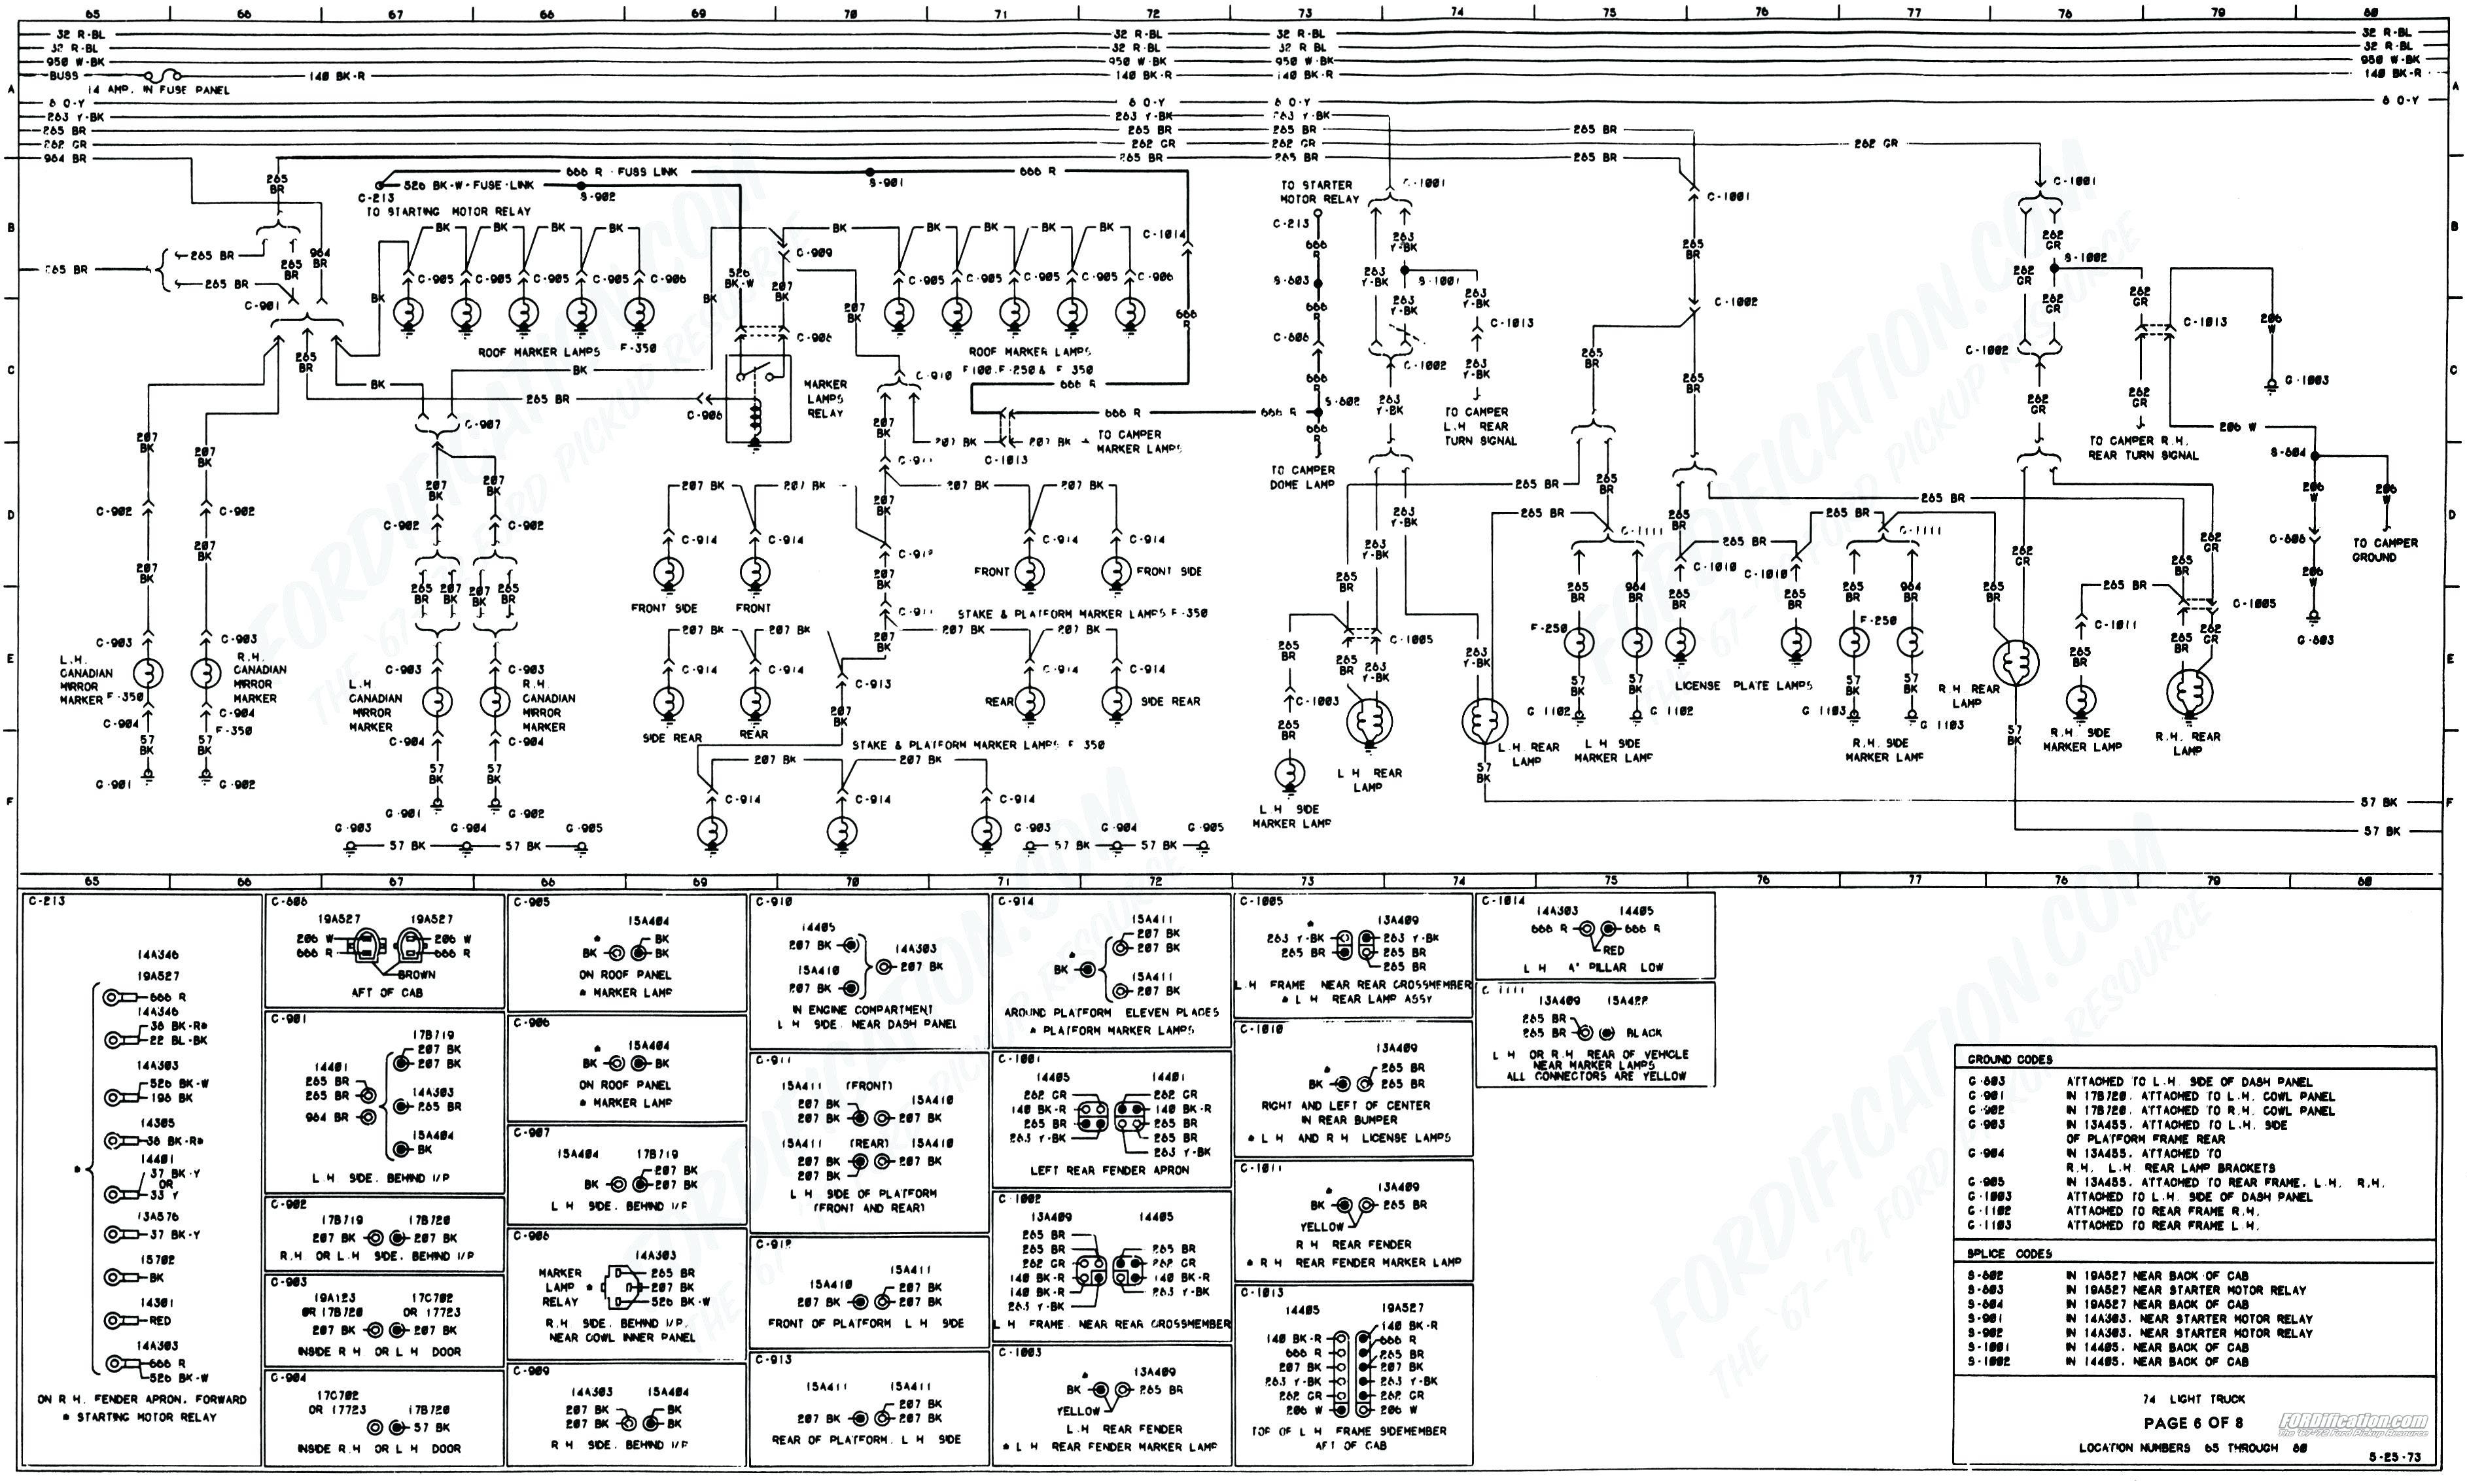 2003 toyota Camry Engine Diagram Wiring Diagram Sterling Truck Wiring Diagrams 2003 toyota Camry 2 4 Of 2003 toyota Camry Engine Diagram